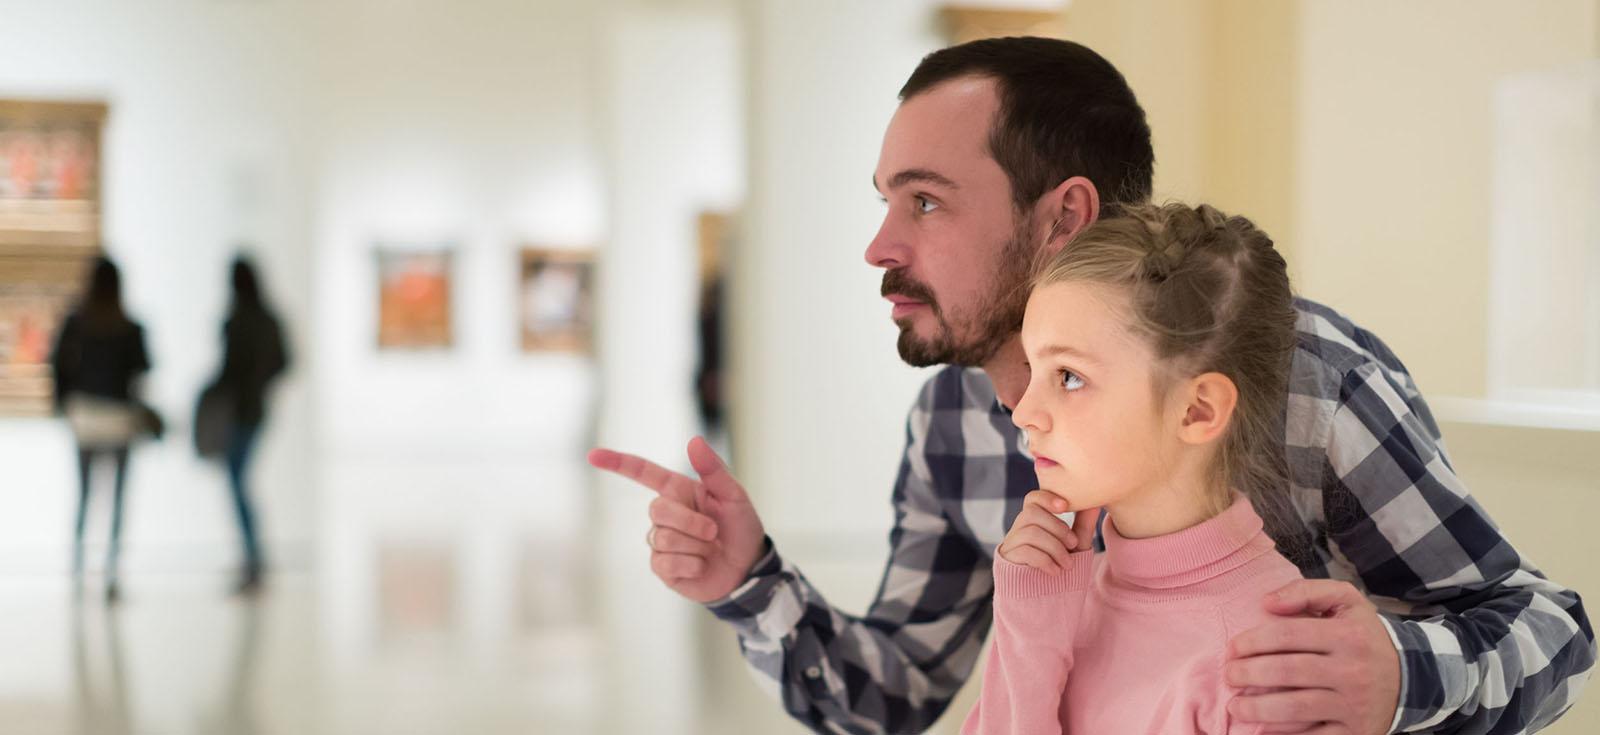 Hauptbild Familien, Kinder, Jugendliche